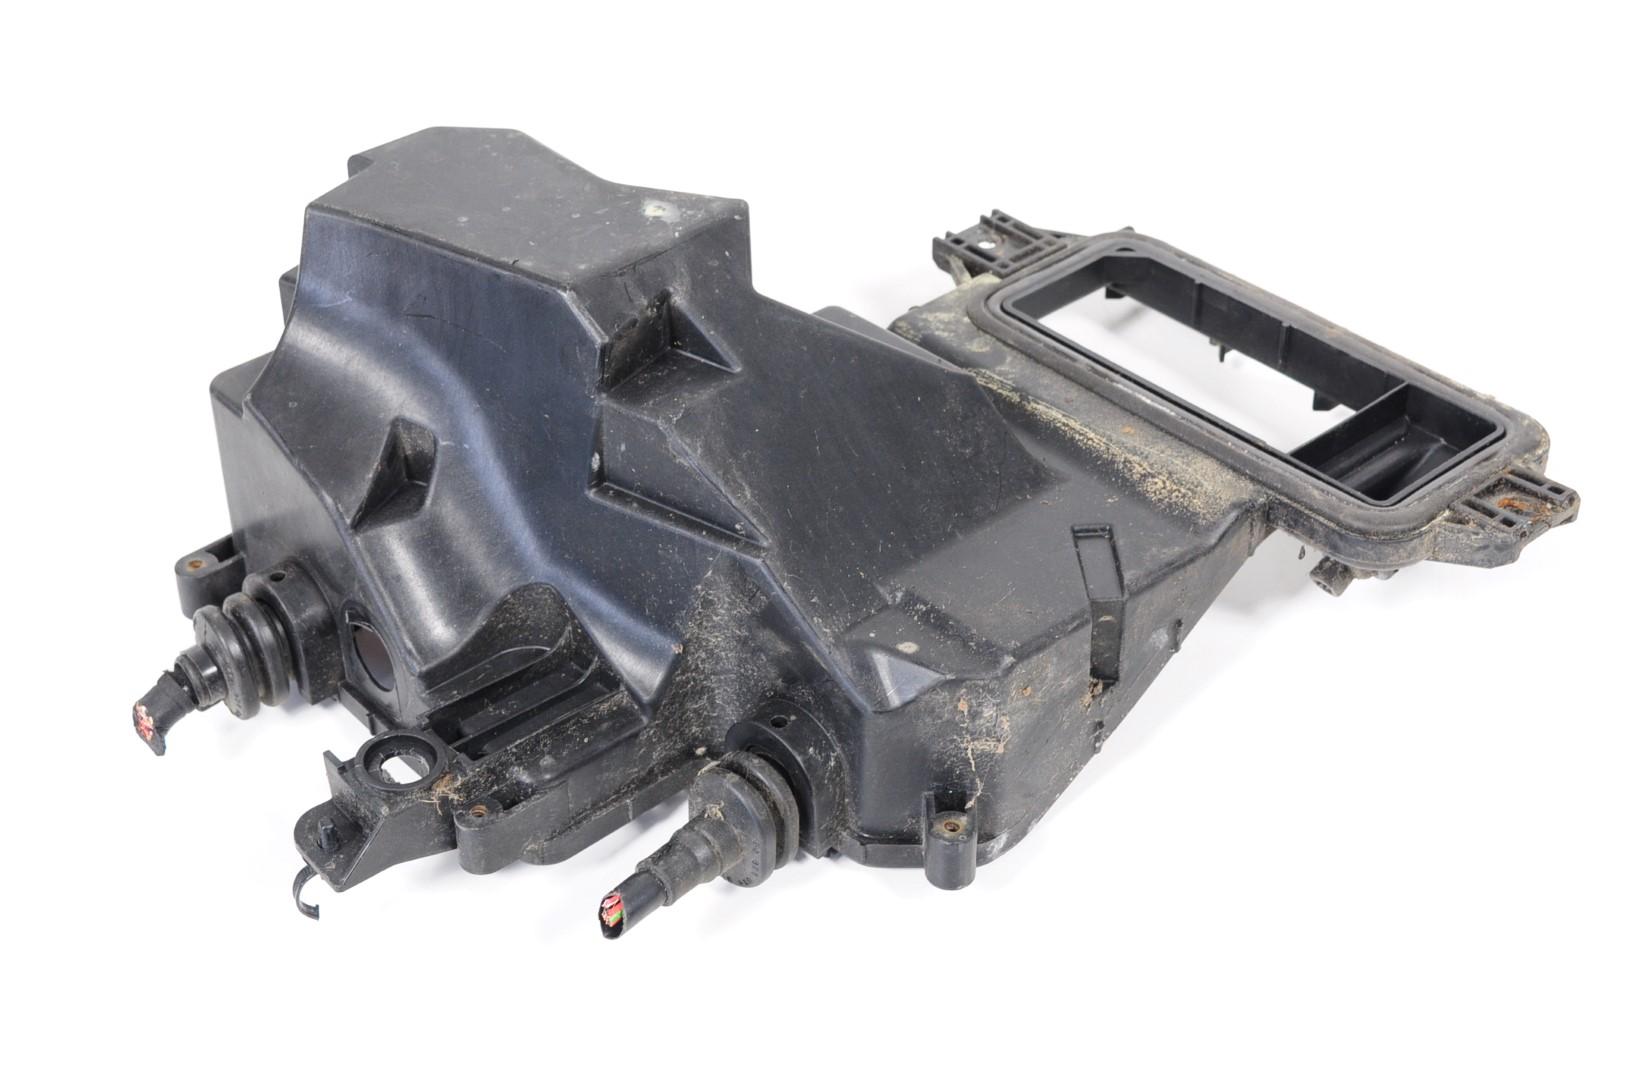 Audi A6 C6 4f 20 Tdi Avant 2006 Rhd Engine Bay Fuse Box 4f0941824 S6 2 0